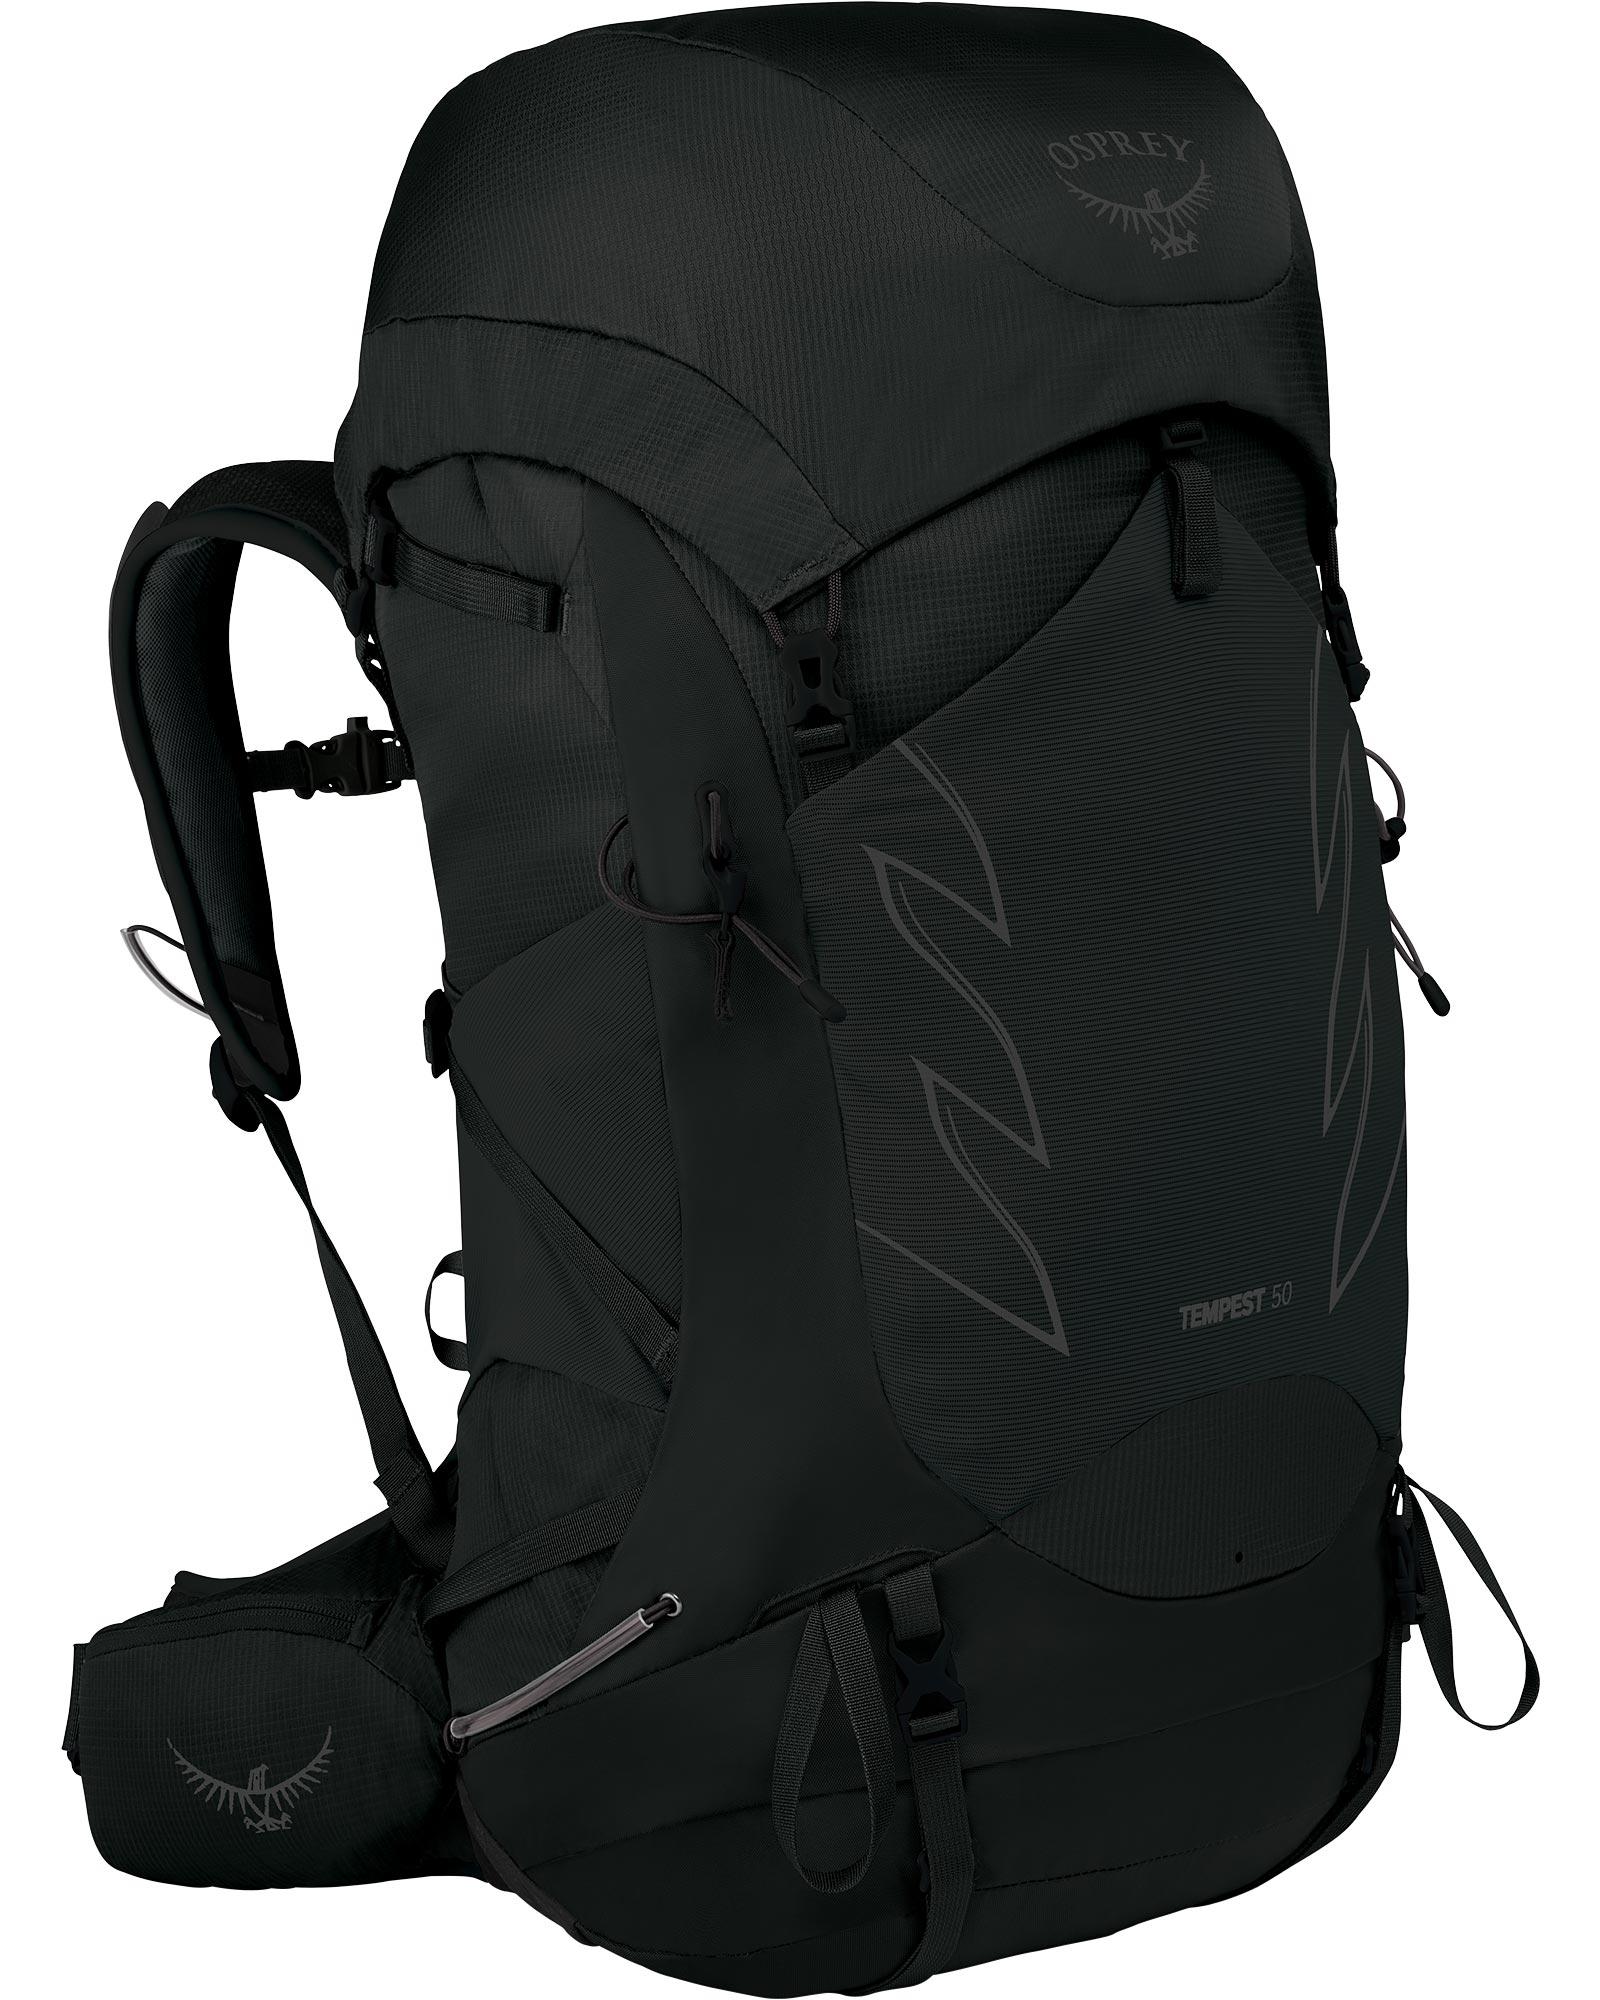 Osprey Women's Tempest 50 Backpack 0